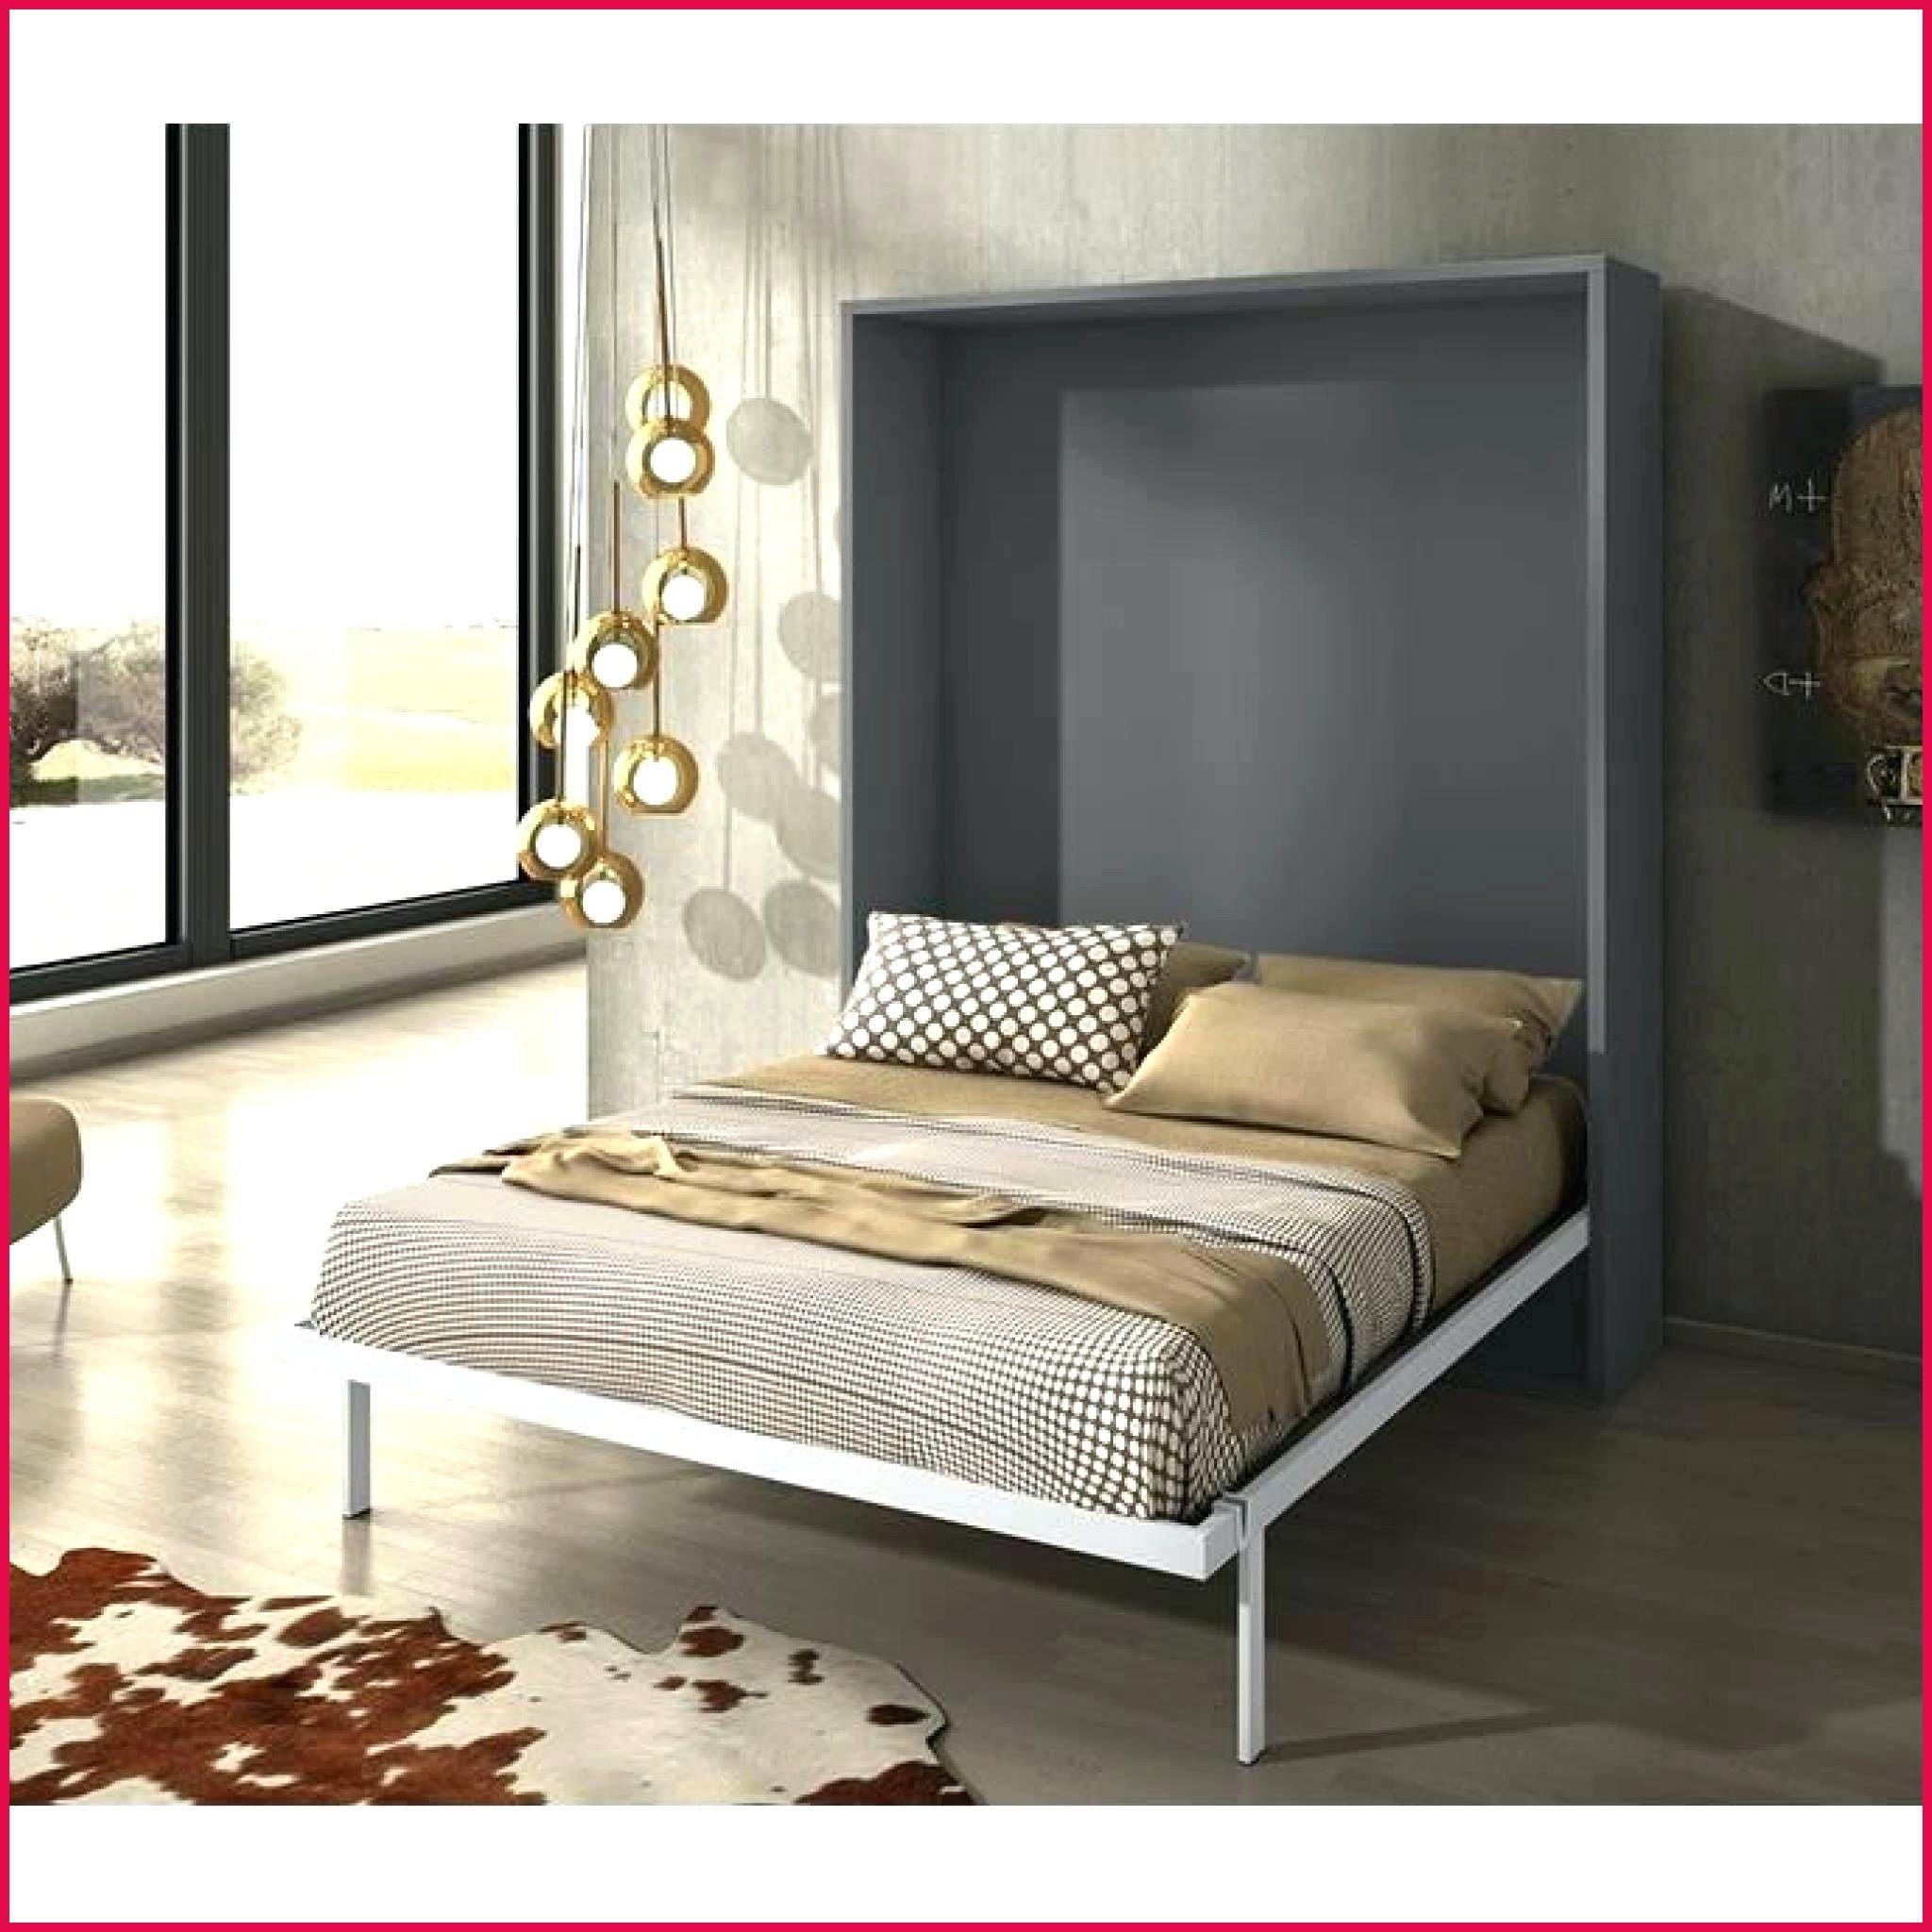 Alinea Lit Bebe Joli Exceptionnel Armoire Lit Ikea  Armoire Lit Escamotable Ikea Awesome